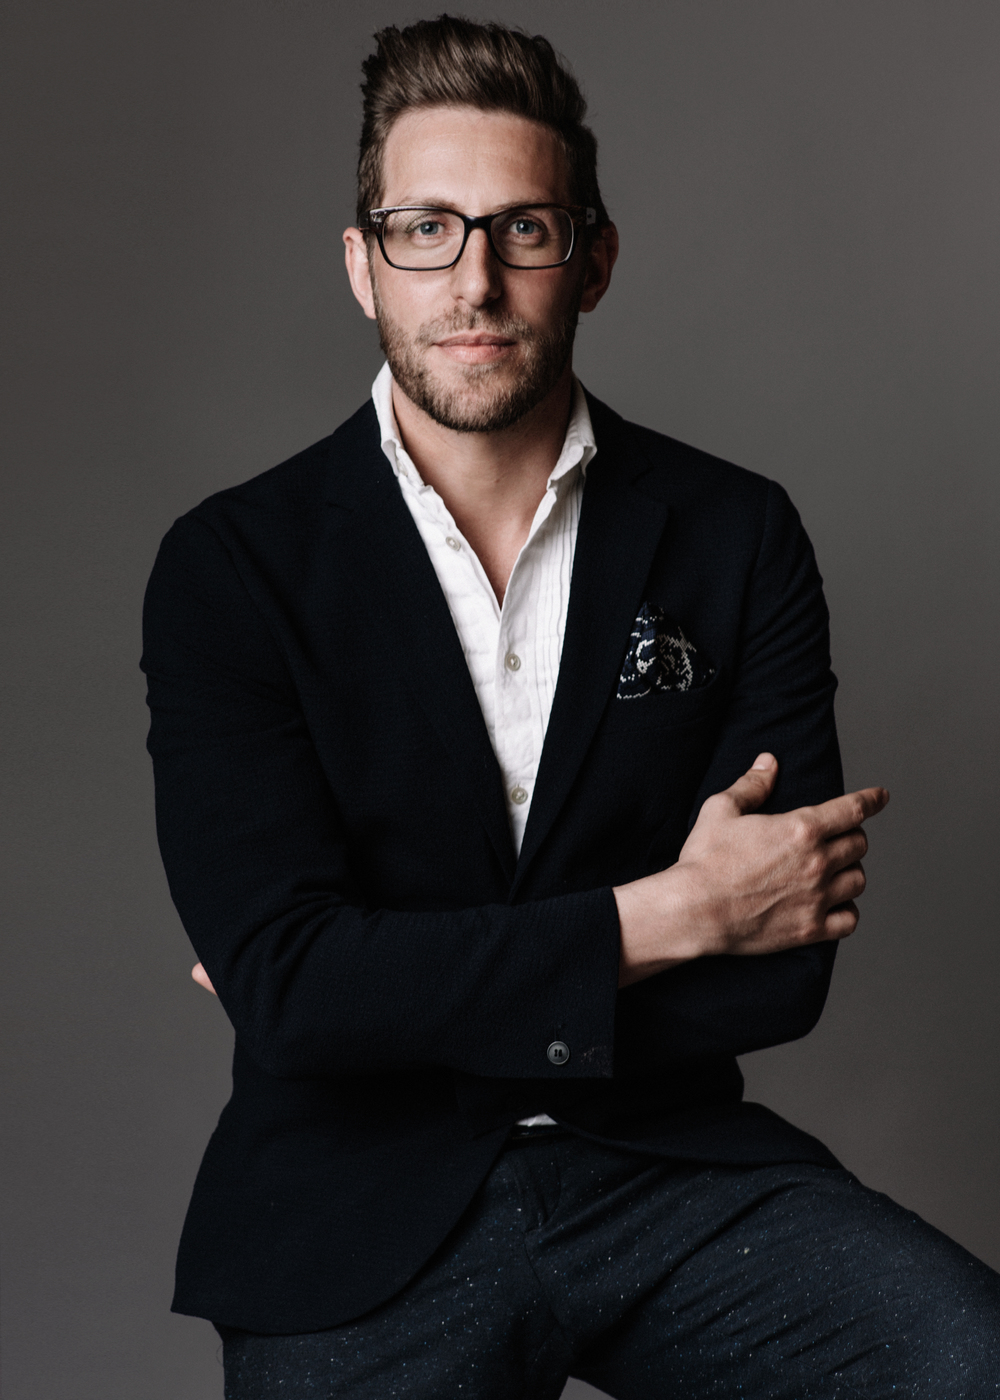 CEO-portrait-corporate-headshot-04.jpg